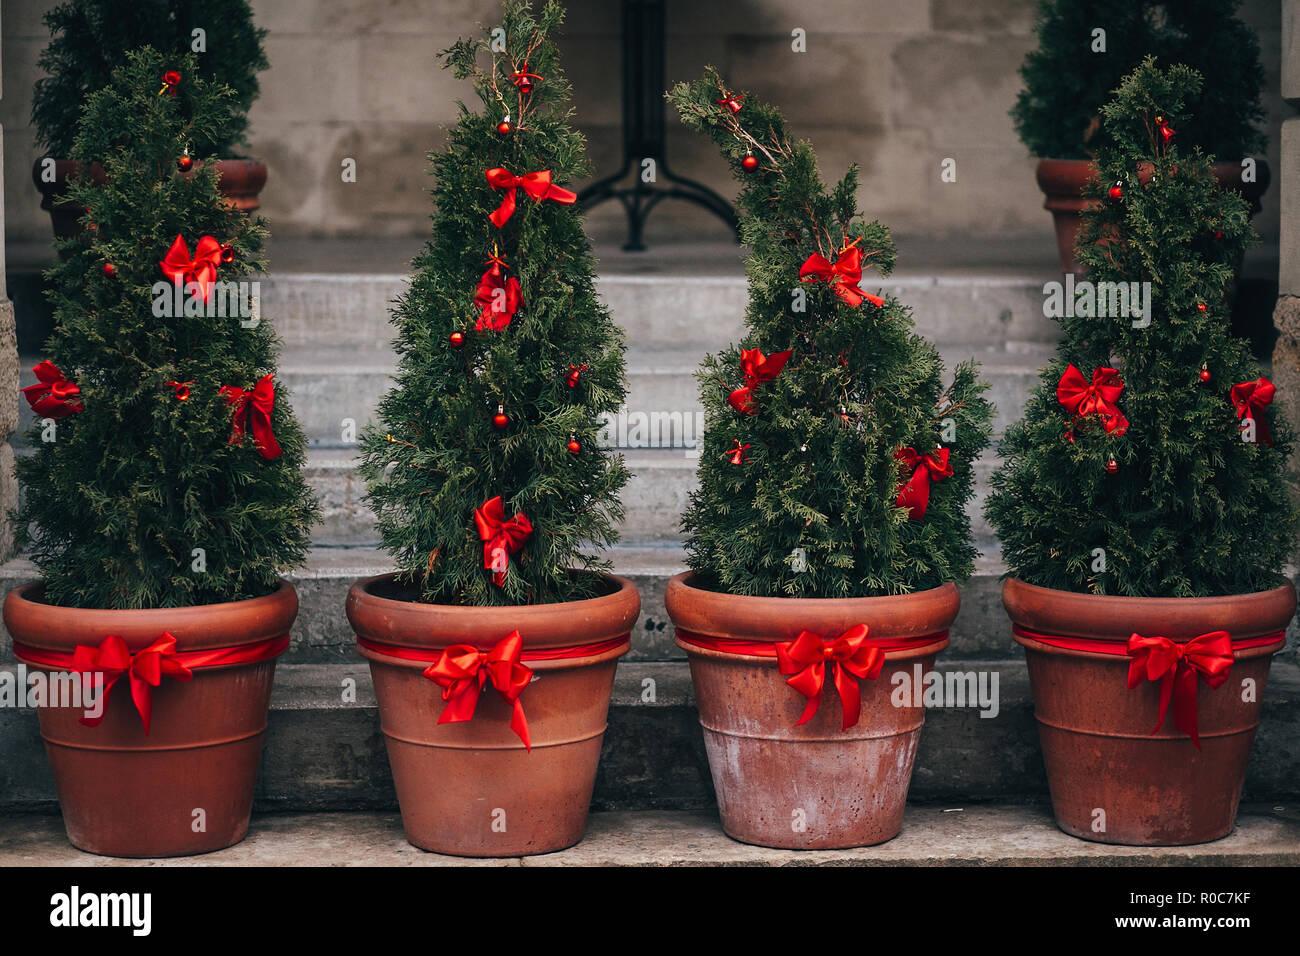 Elegante strada di Natale decorazioni verde rami di abete